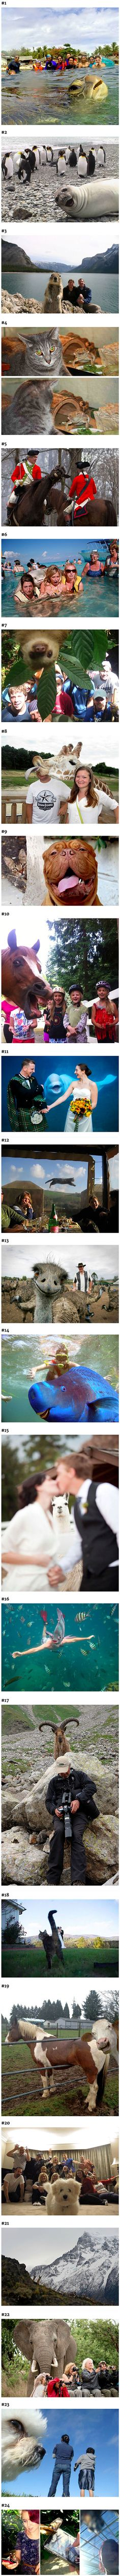 These strange animals are experts at photobombing.